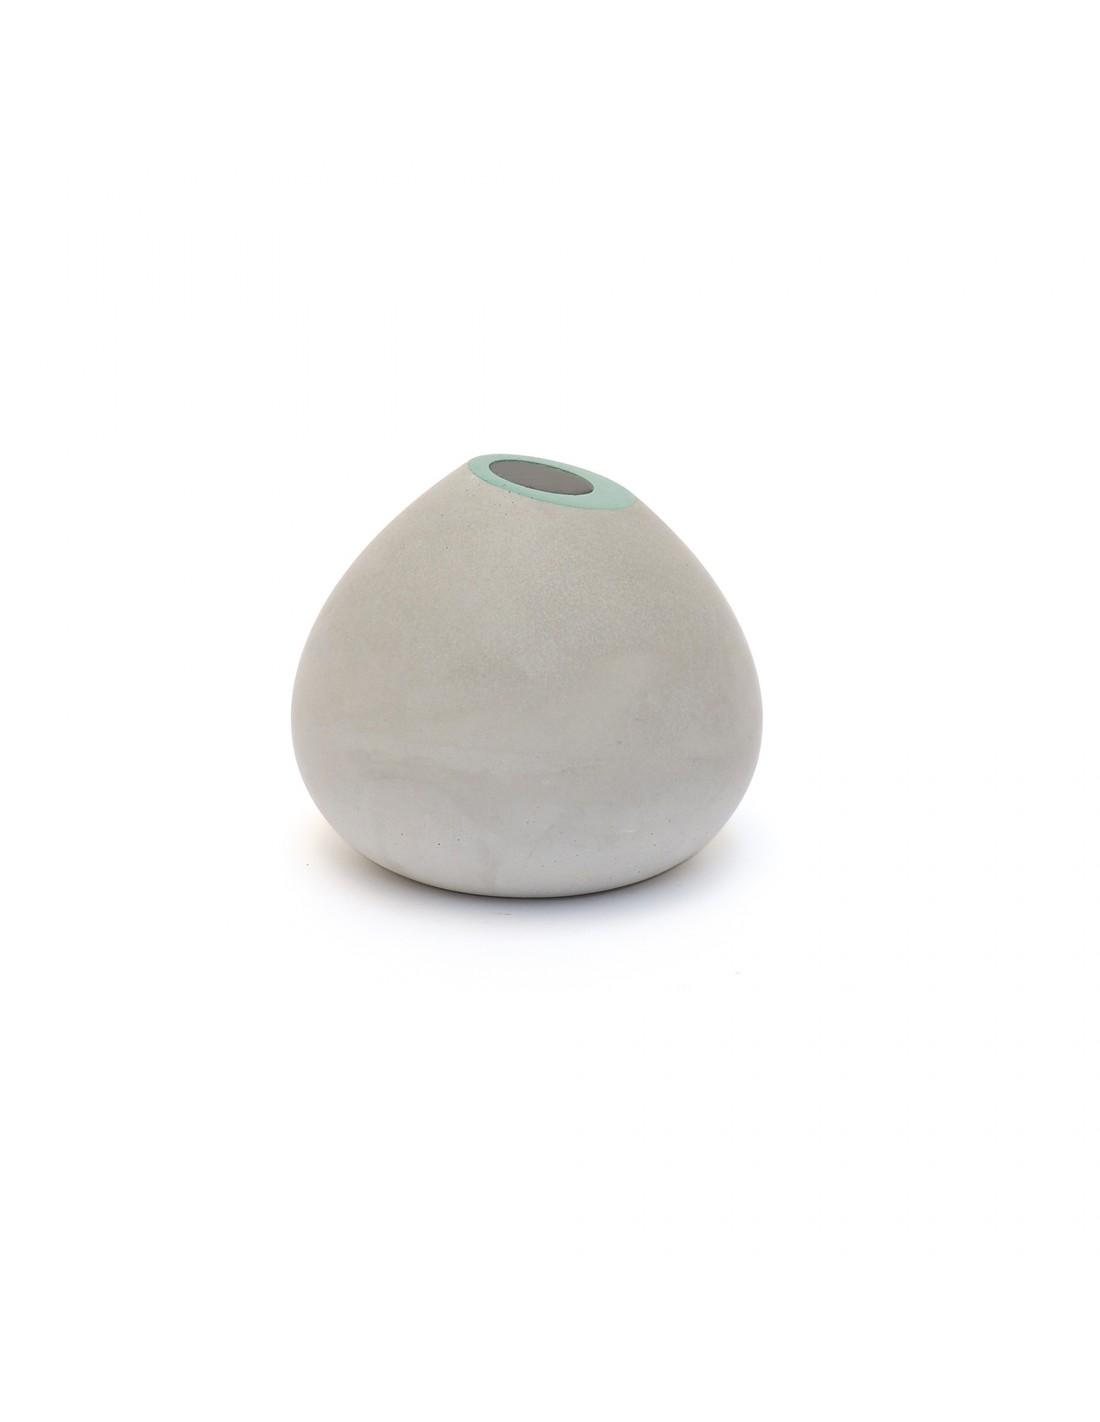 Soliflore en béton beryl green